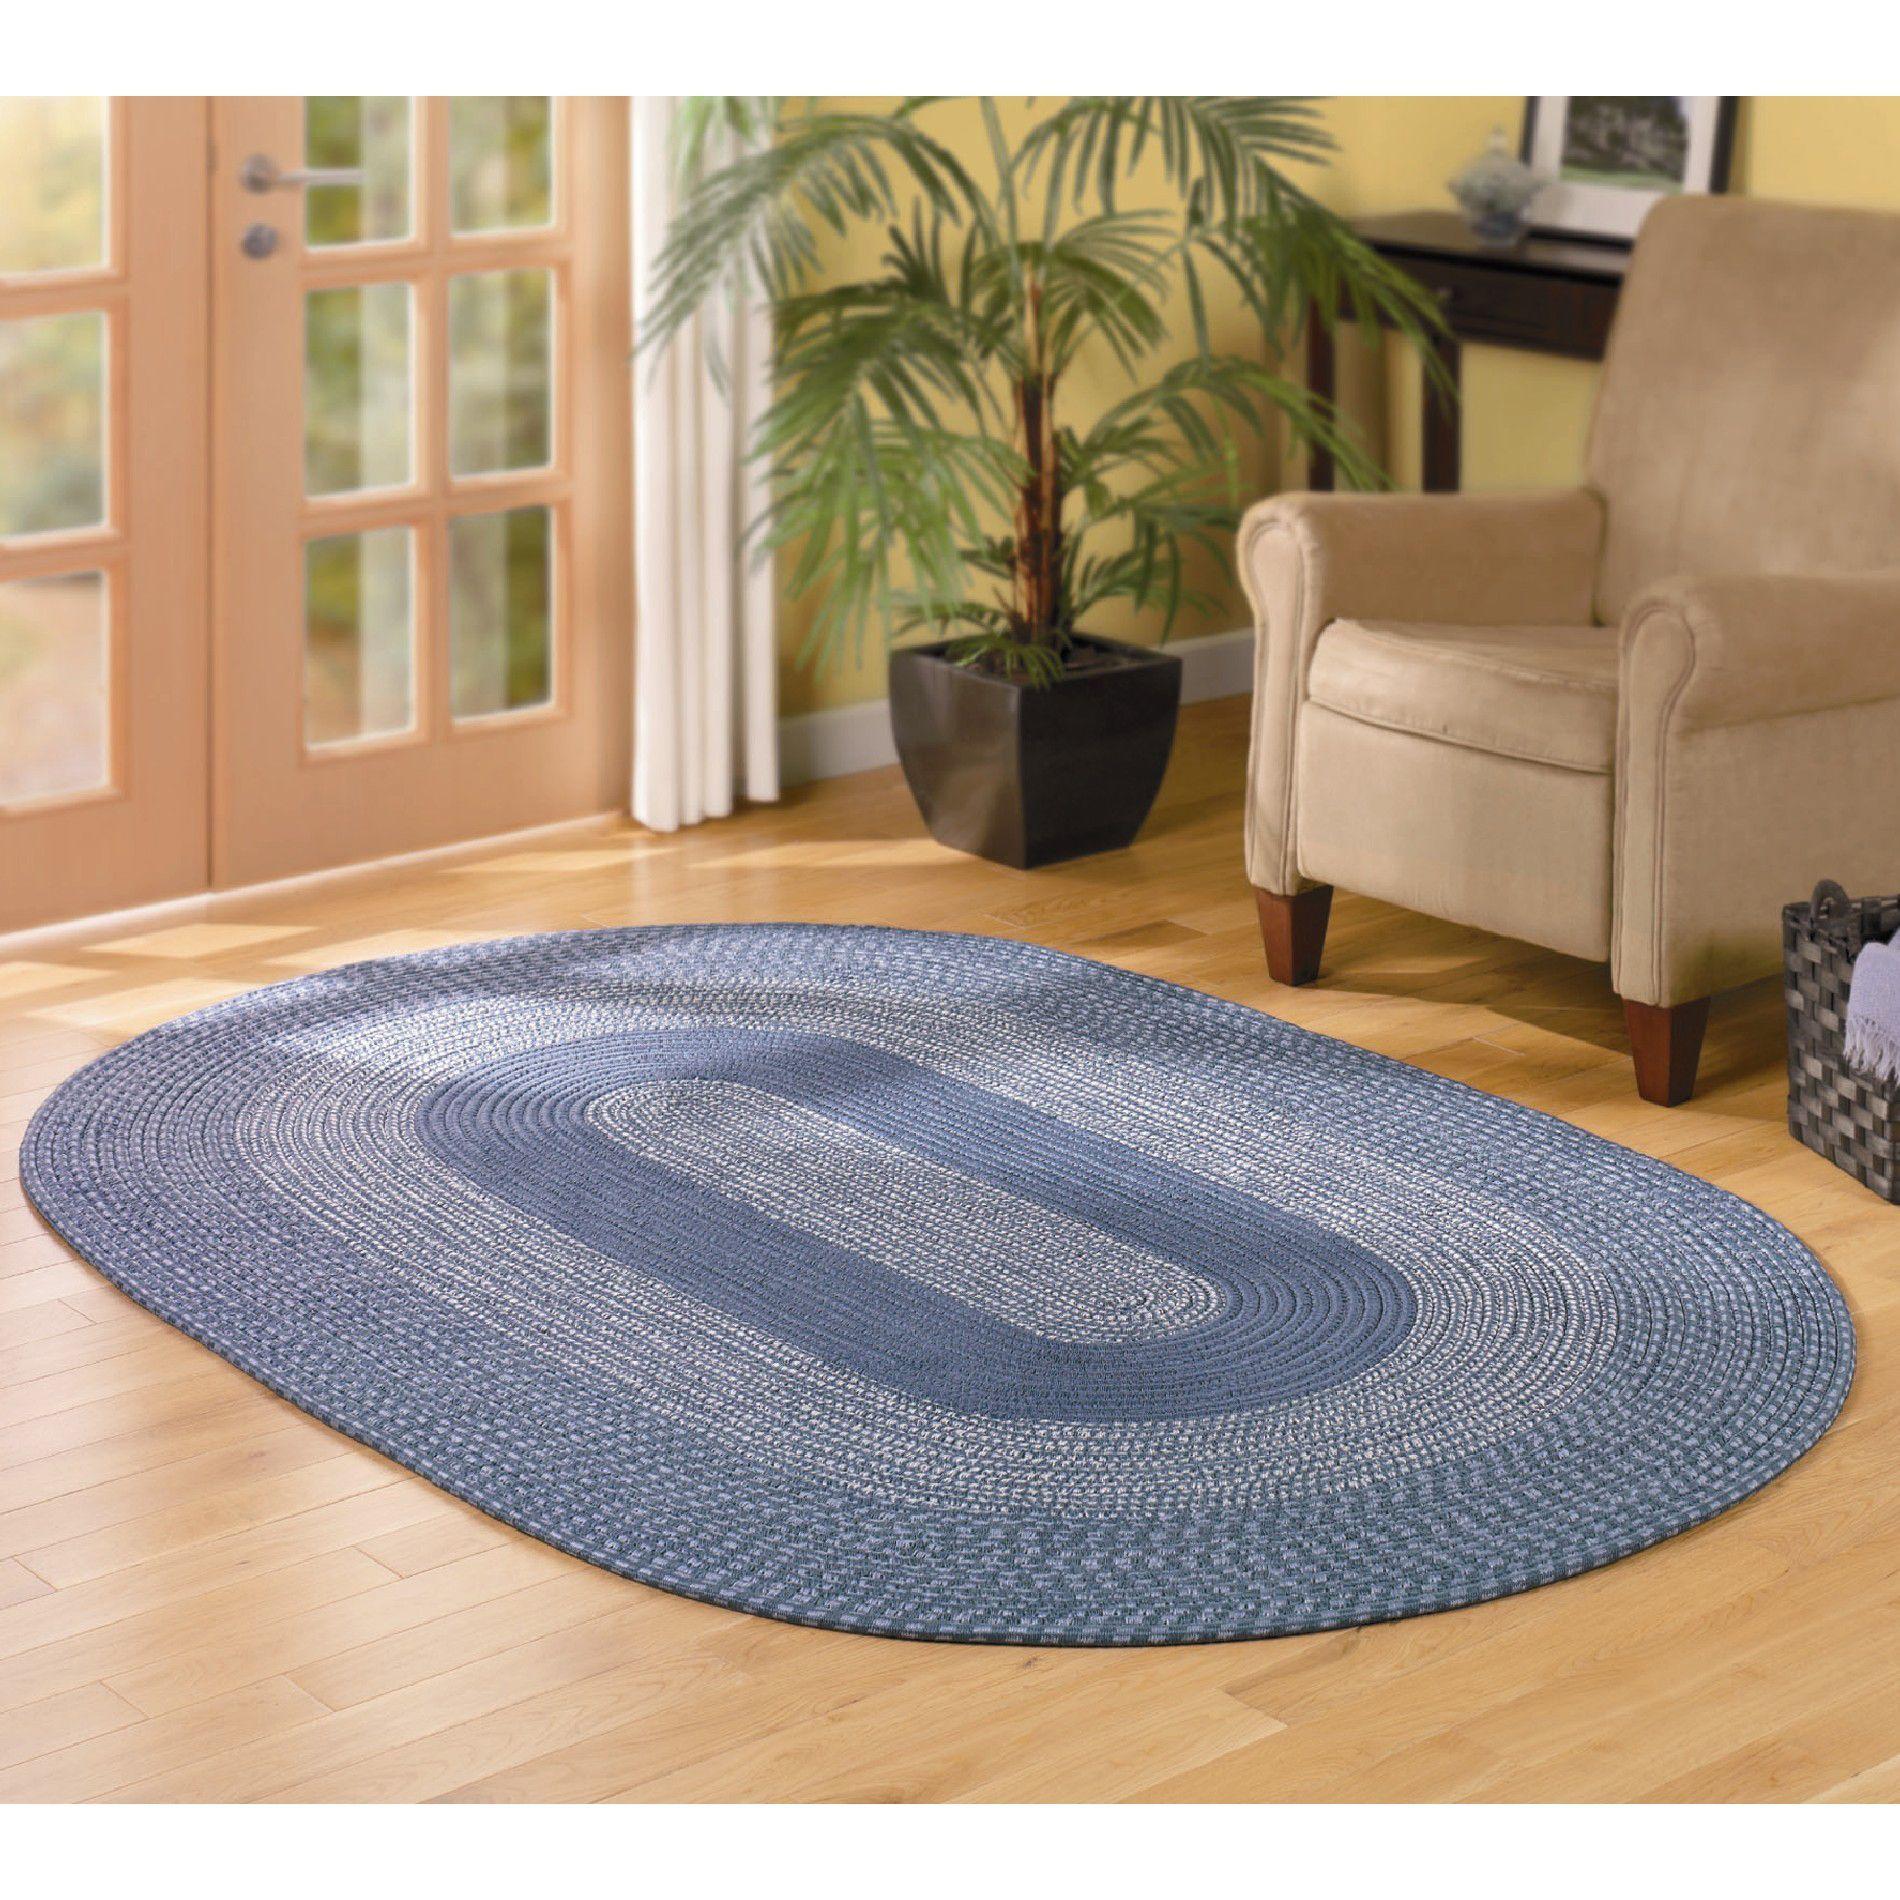 Essential Home Wedgewood Braided Rug 30x48 Blue